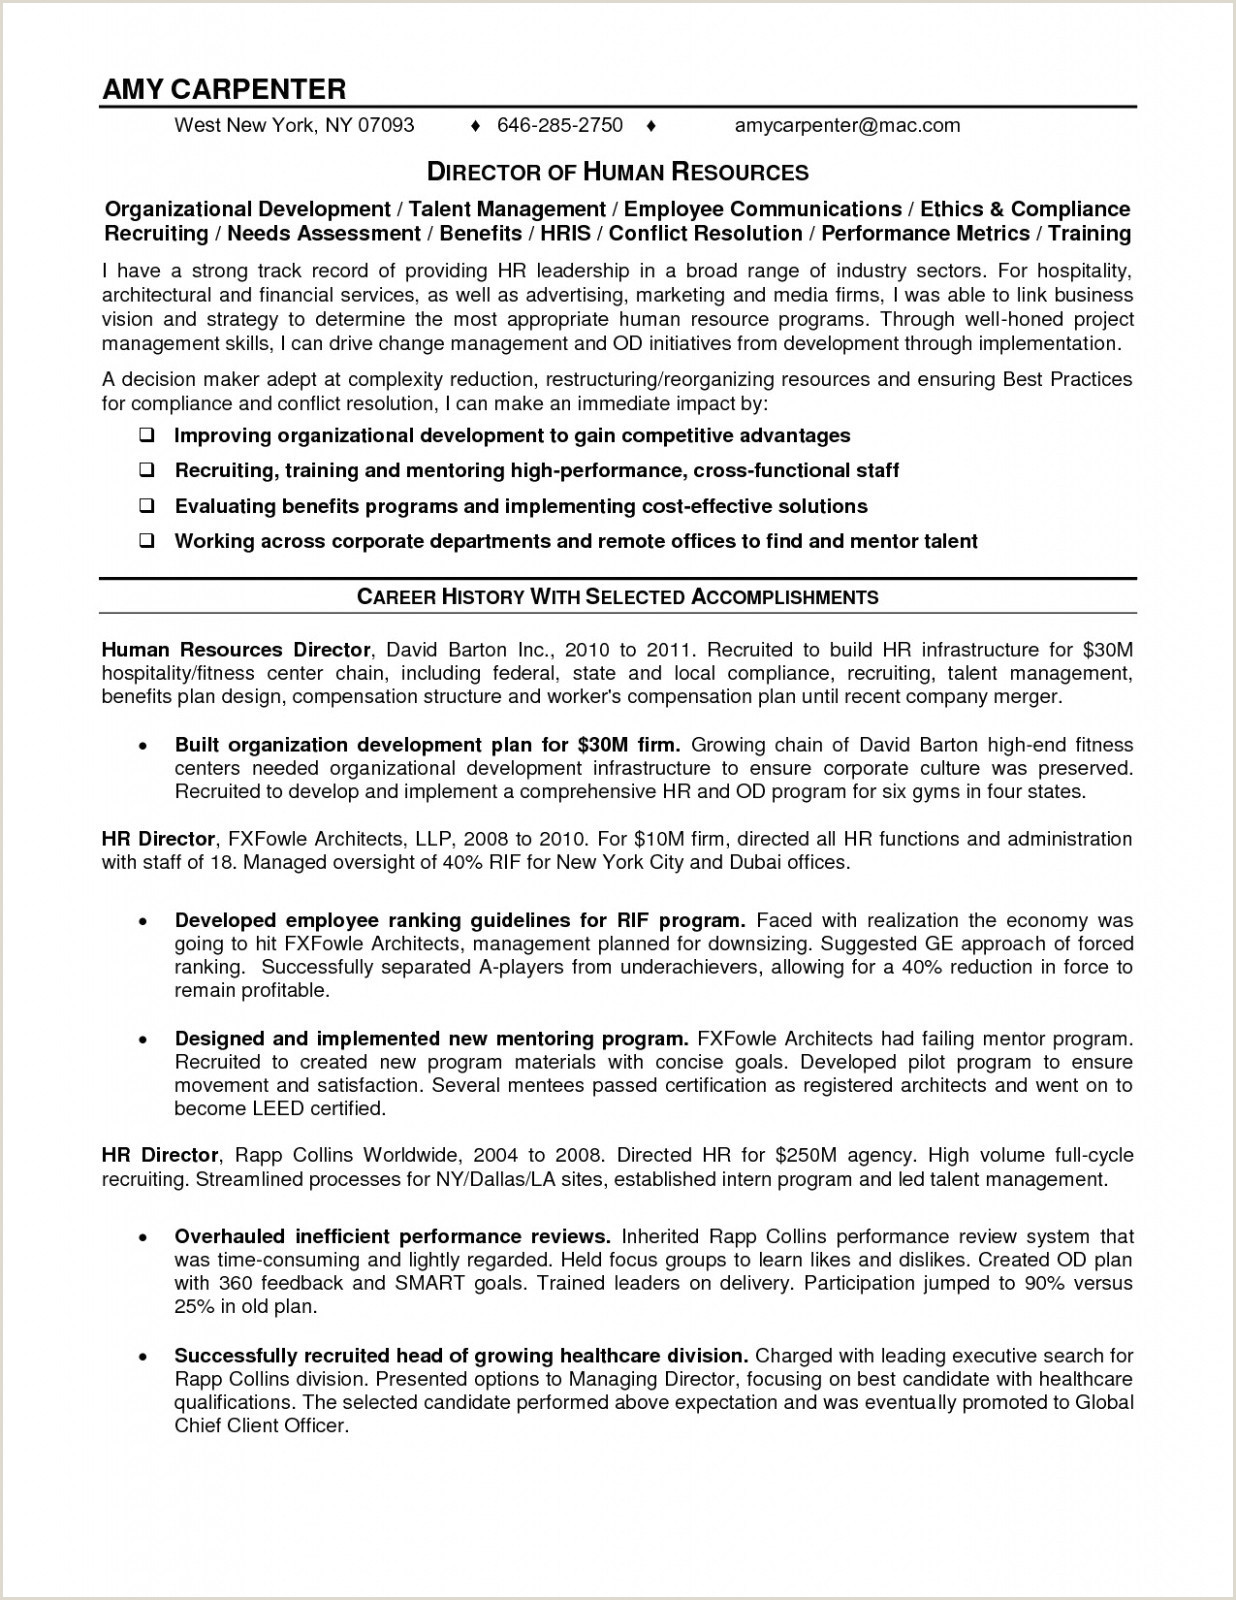 Resume format for Job Docx Architect Resume format Doc Cv Template solution Microsoft